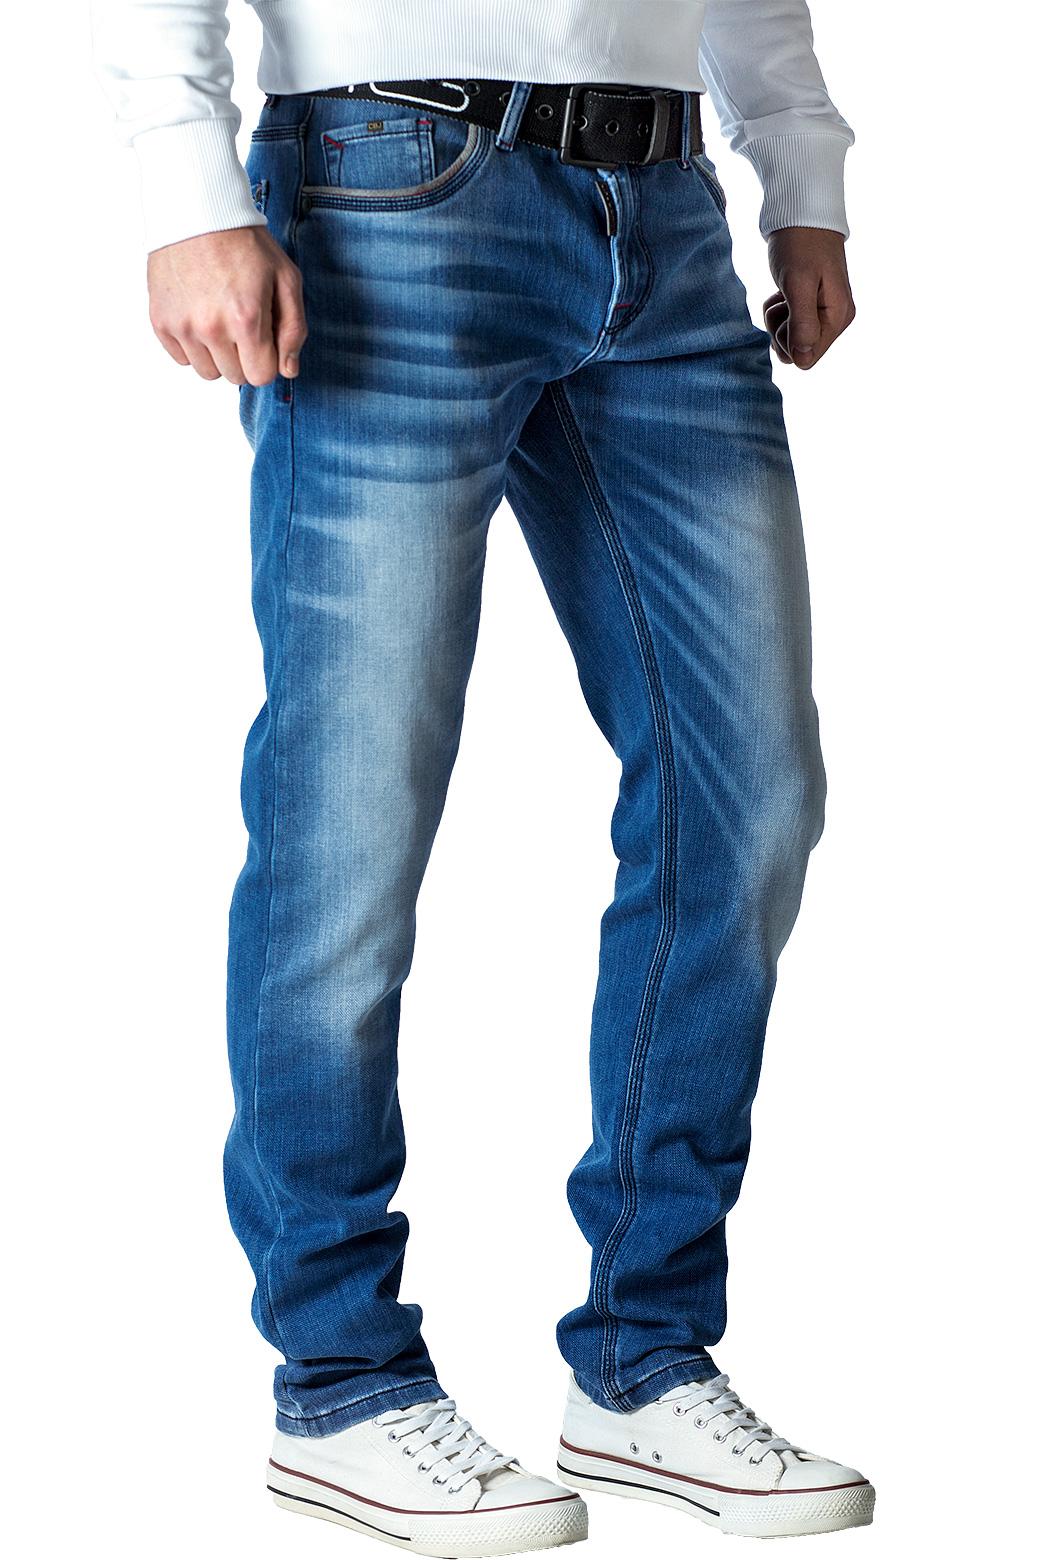 Cipo-amp-Baxx-Uomo-Jeans-Pantaloni-ricamate-Biker-Style-streetwear-nervature-pattern-Dope miniatura 22